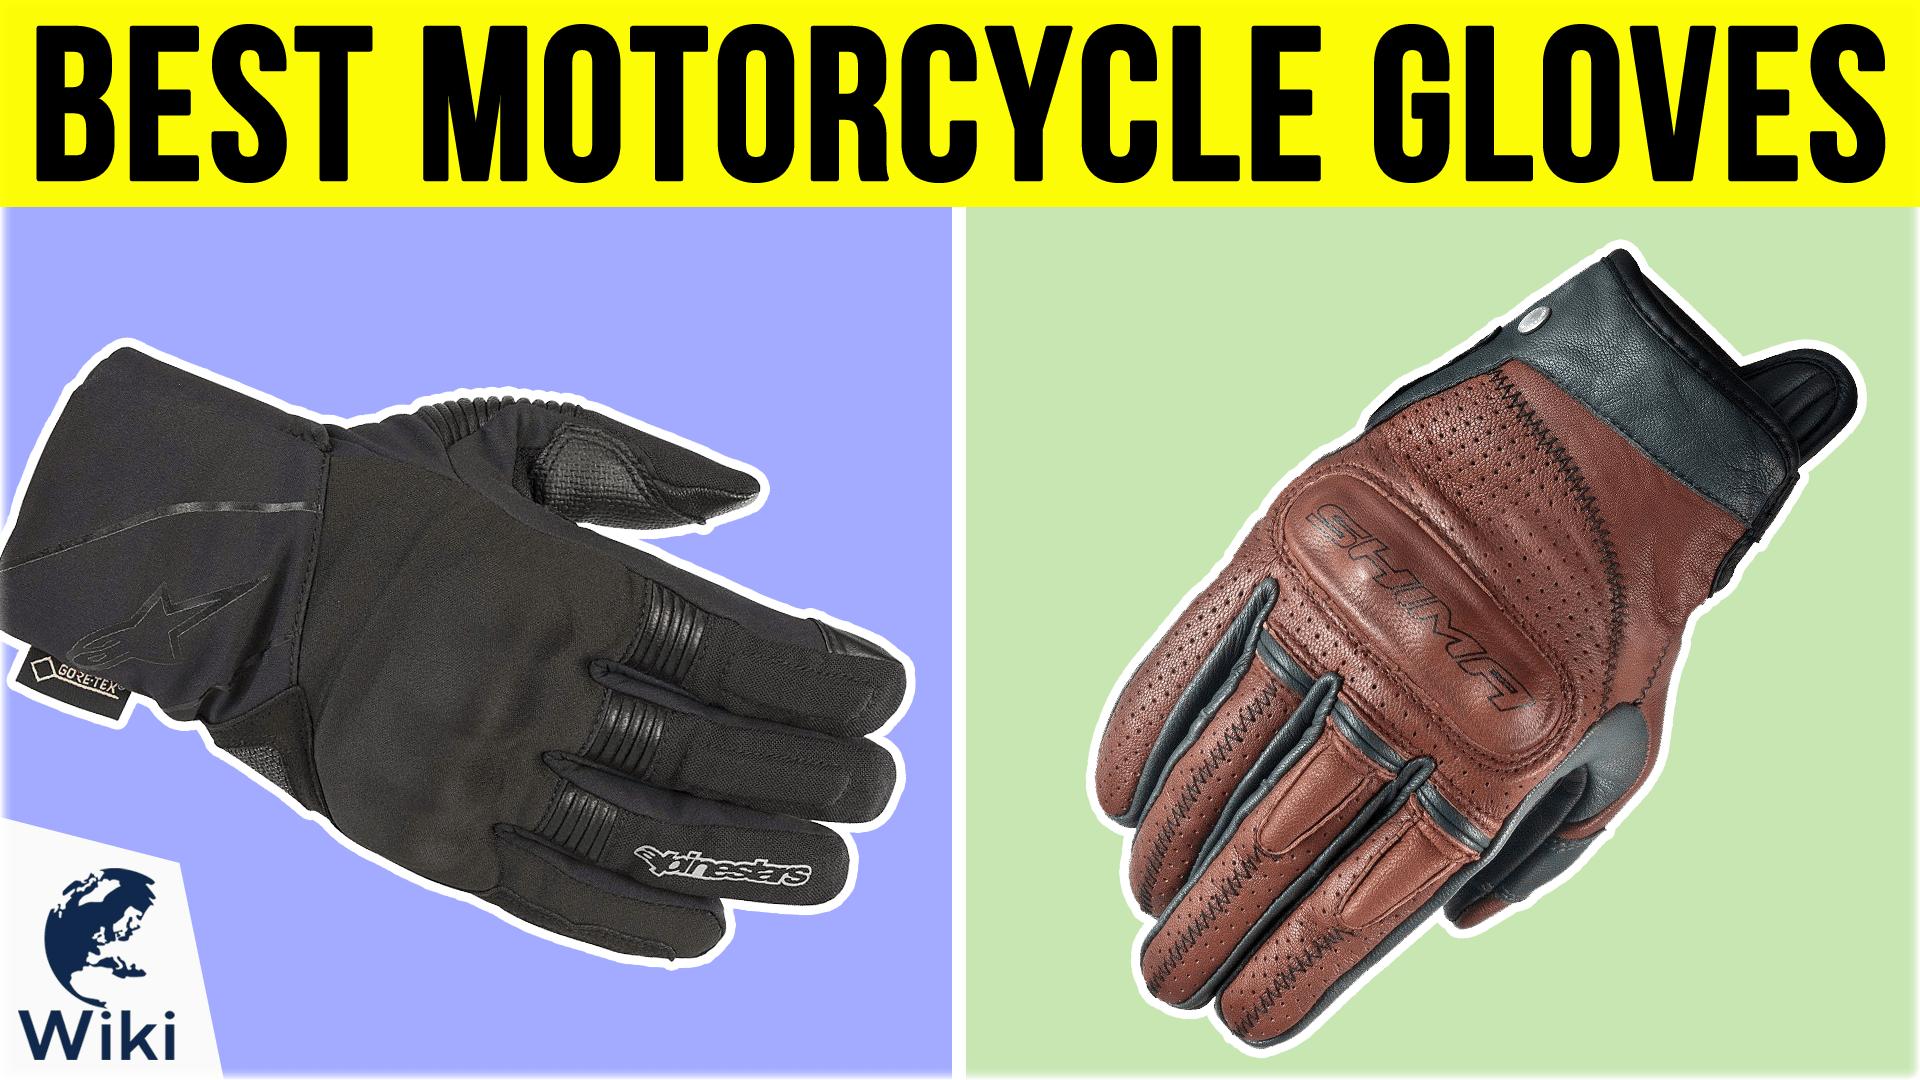 XXX-Large Alpinestars 1694350106 Motorcycle Gloves SMX-2 Air Carbon V2 Black-3XL Black